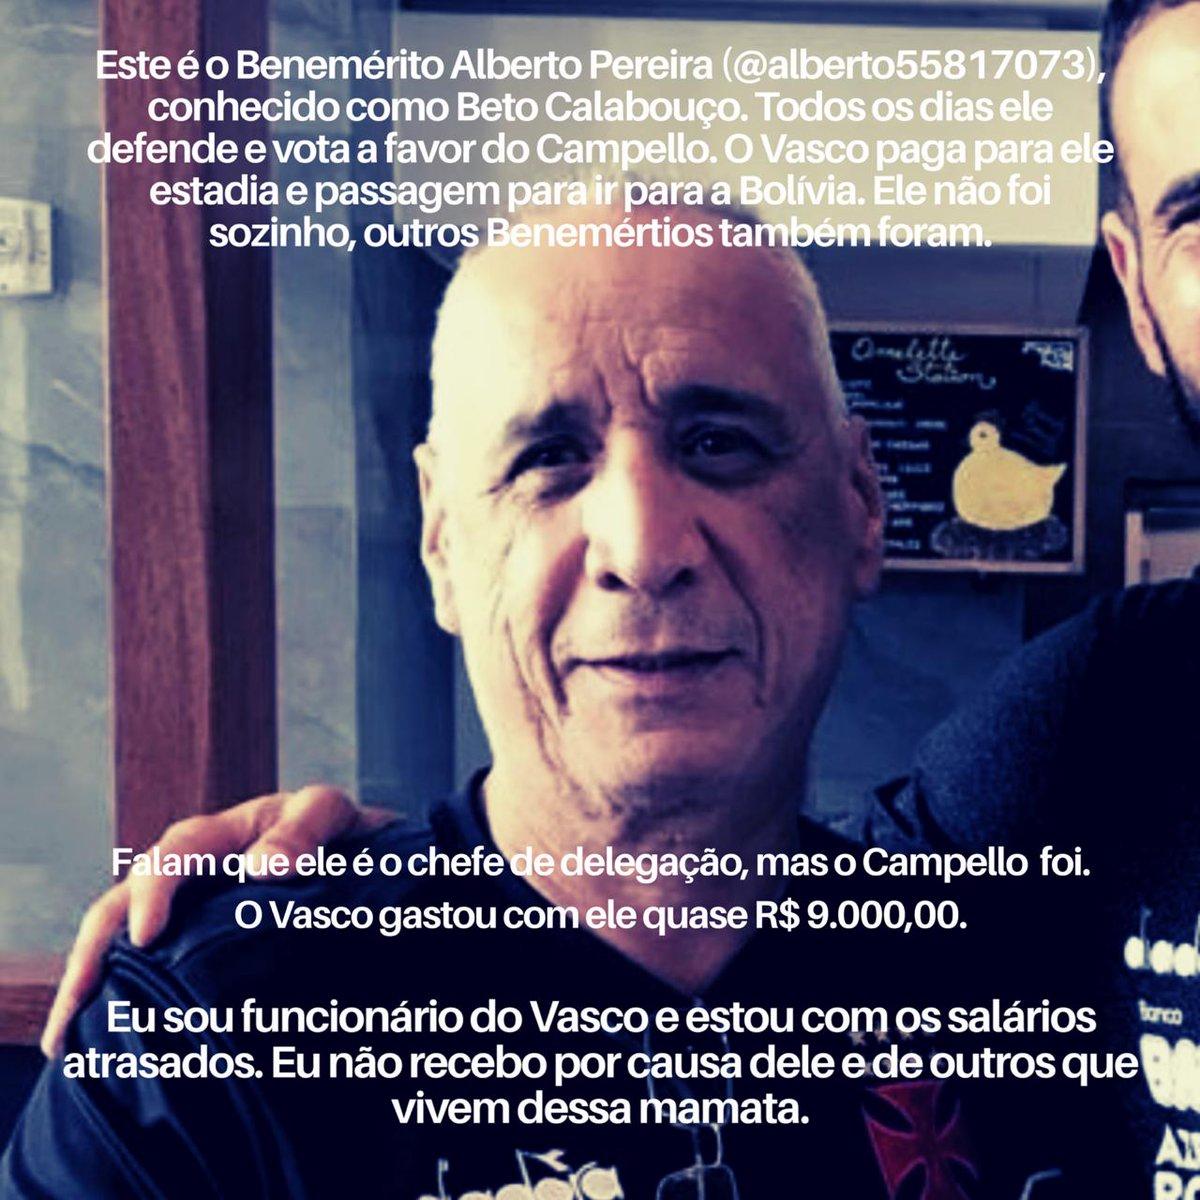 Beto TÁNOBOLSO e cia pic.twitter.com/9dO1LkX3Wx